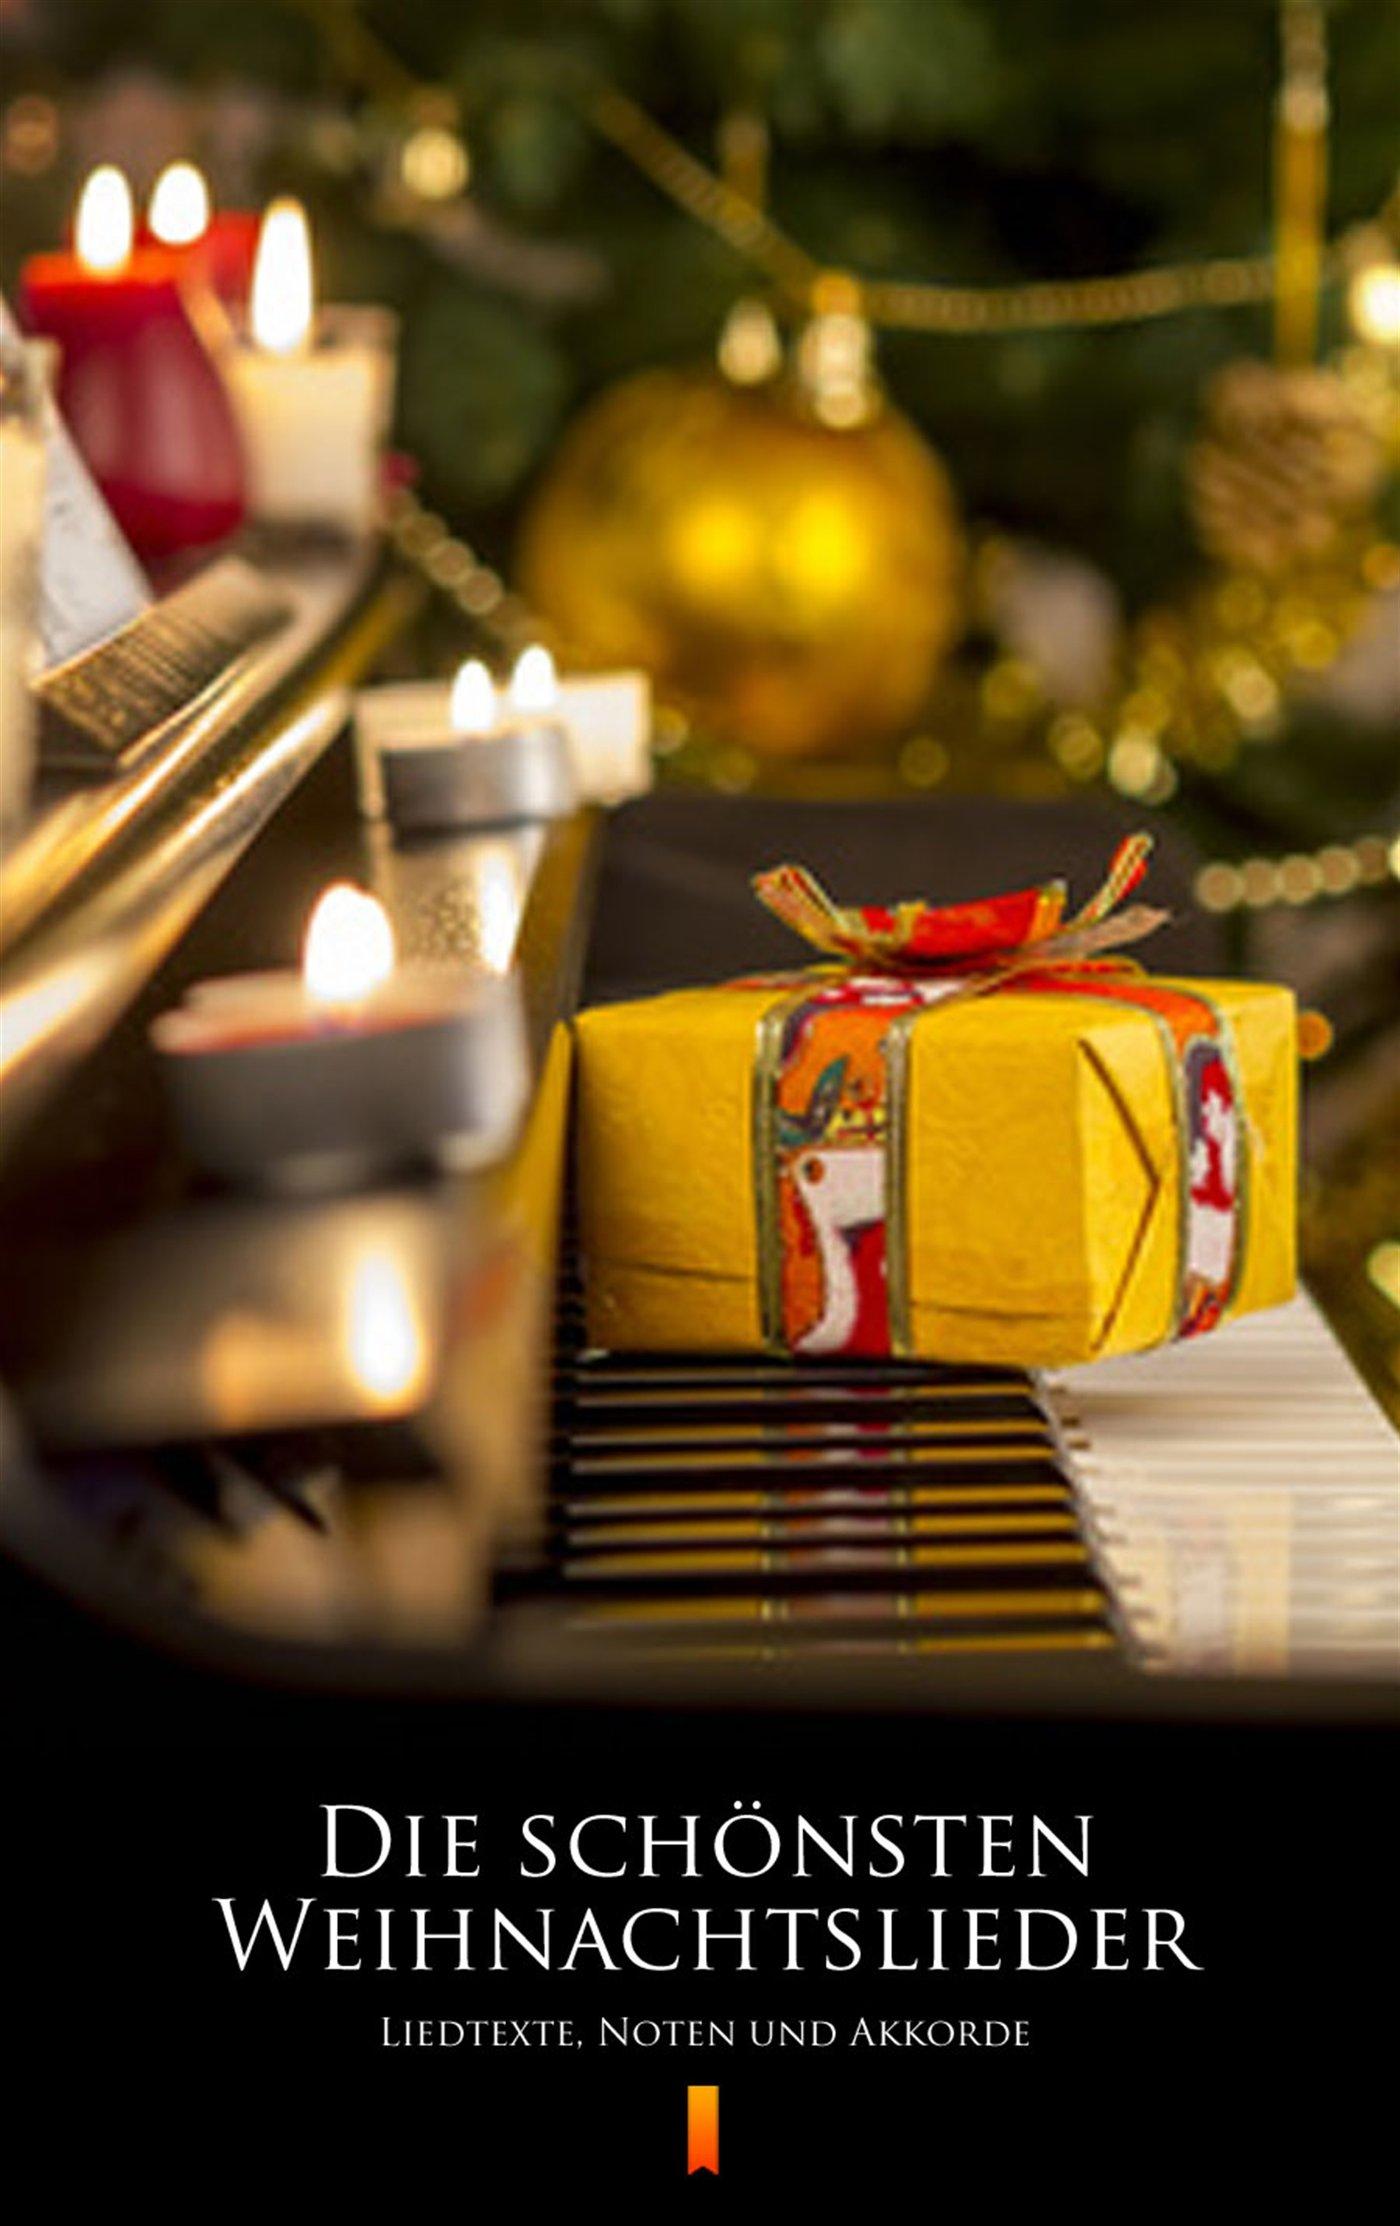 Die schonsten Weihnachtslieder - Ebook (Książka na Kindle) do pobrania w formacie MOBI